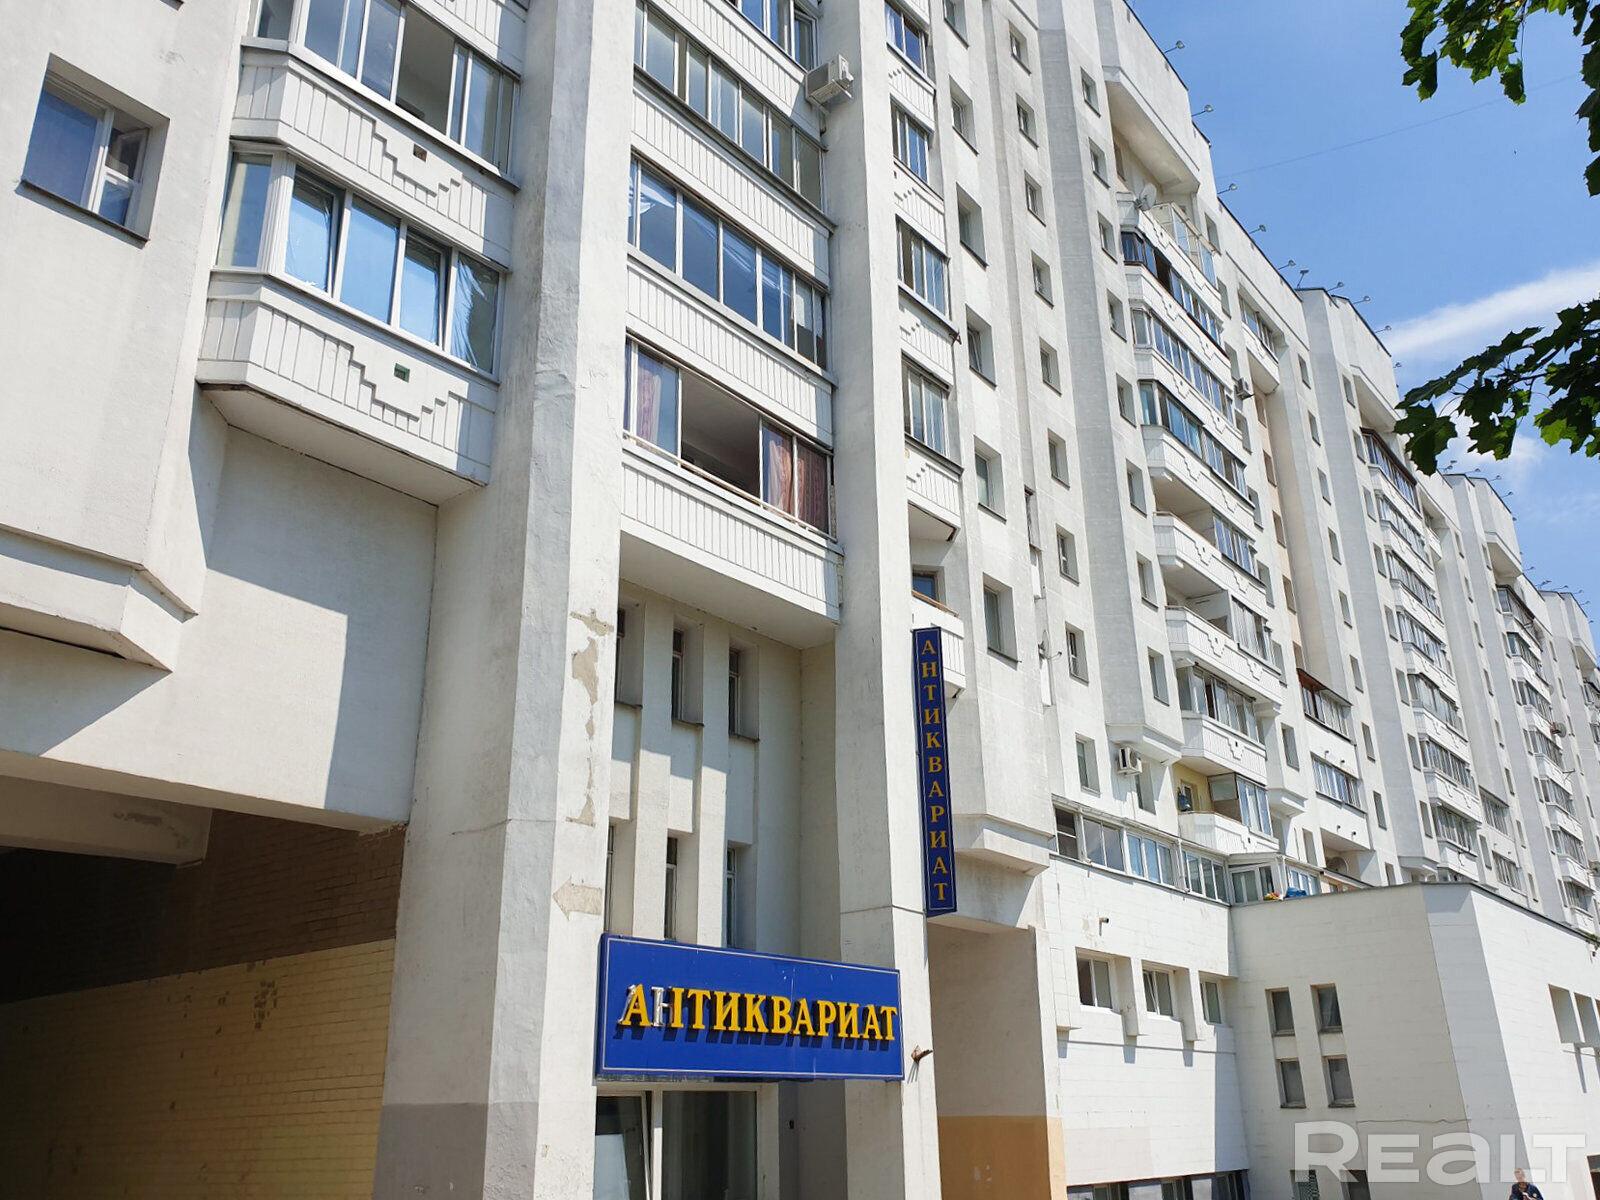 Продается 3-х комнатная квартира, ул. Сторожовская д.8 - фото №19